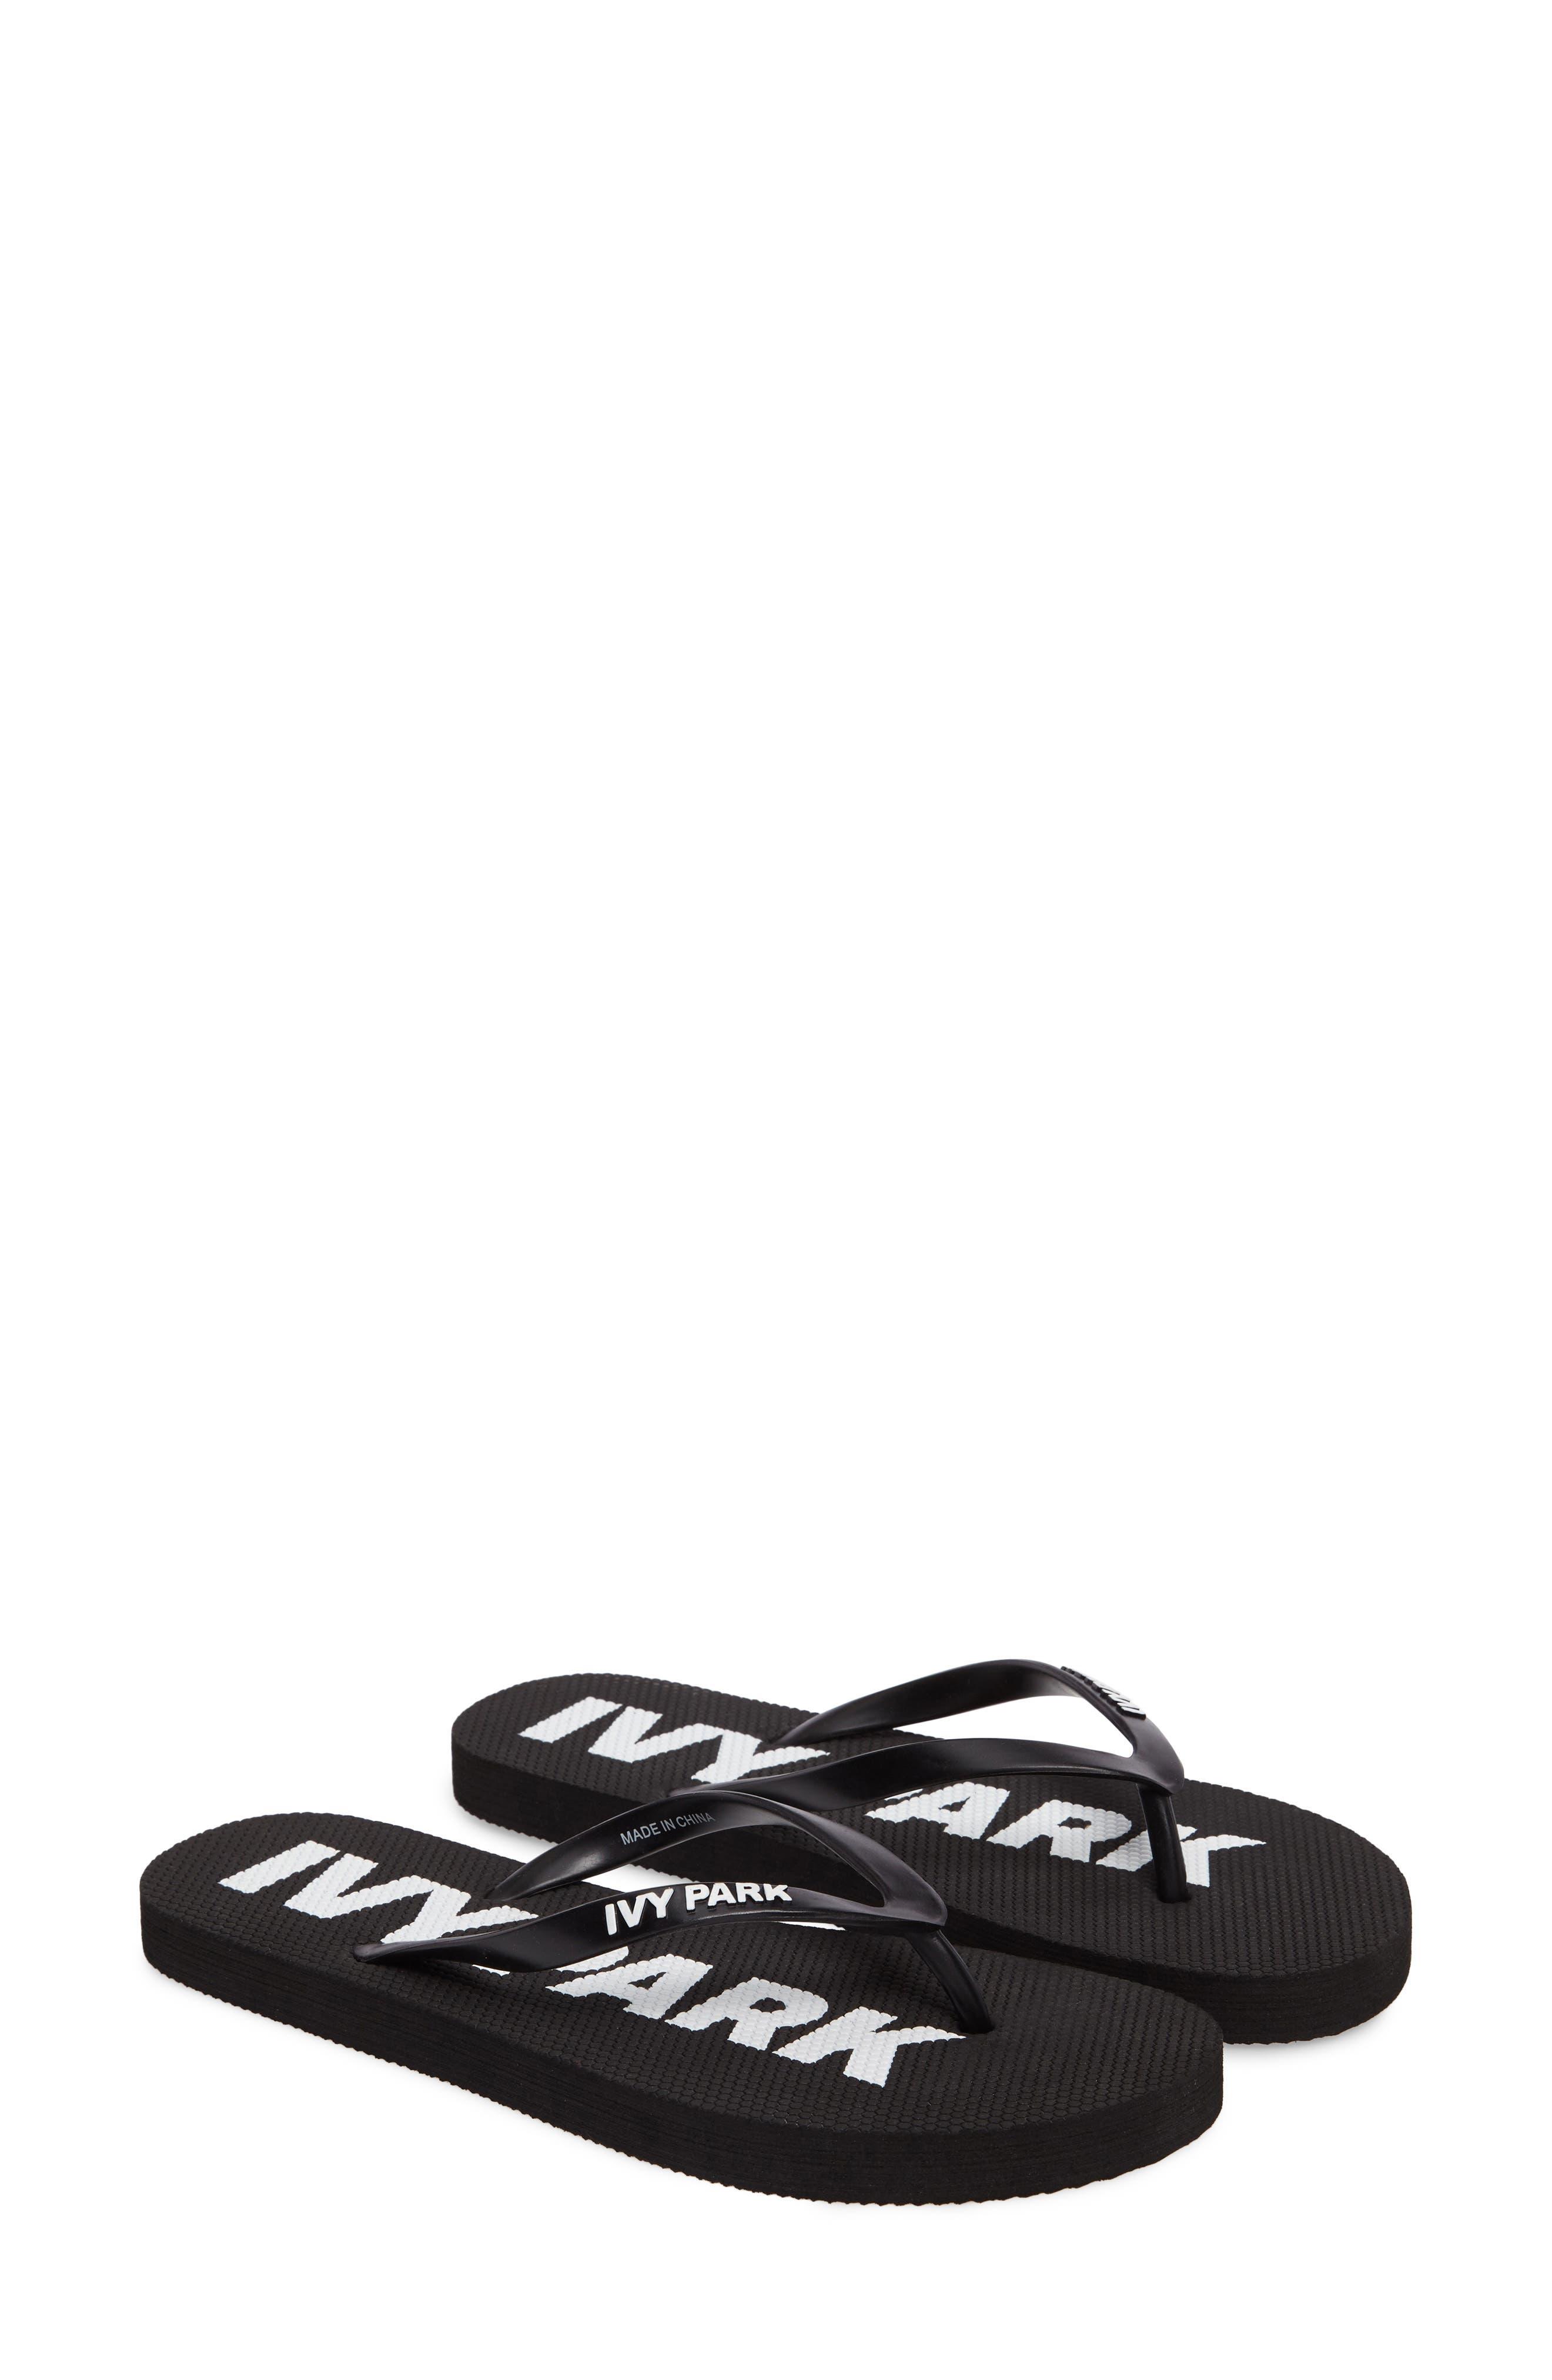 Alternate Image 2  - IVY PARK® Logo Flip Flops (Women)